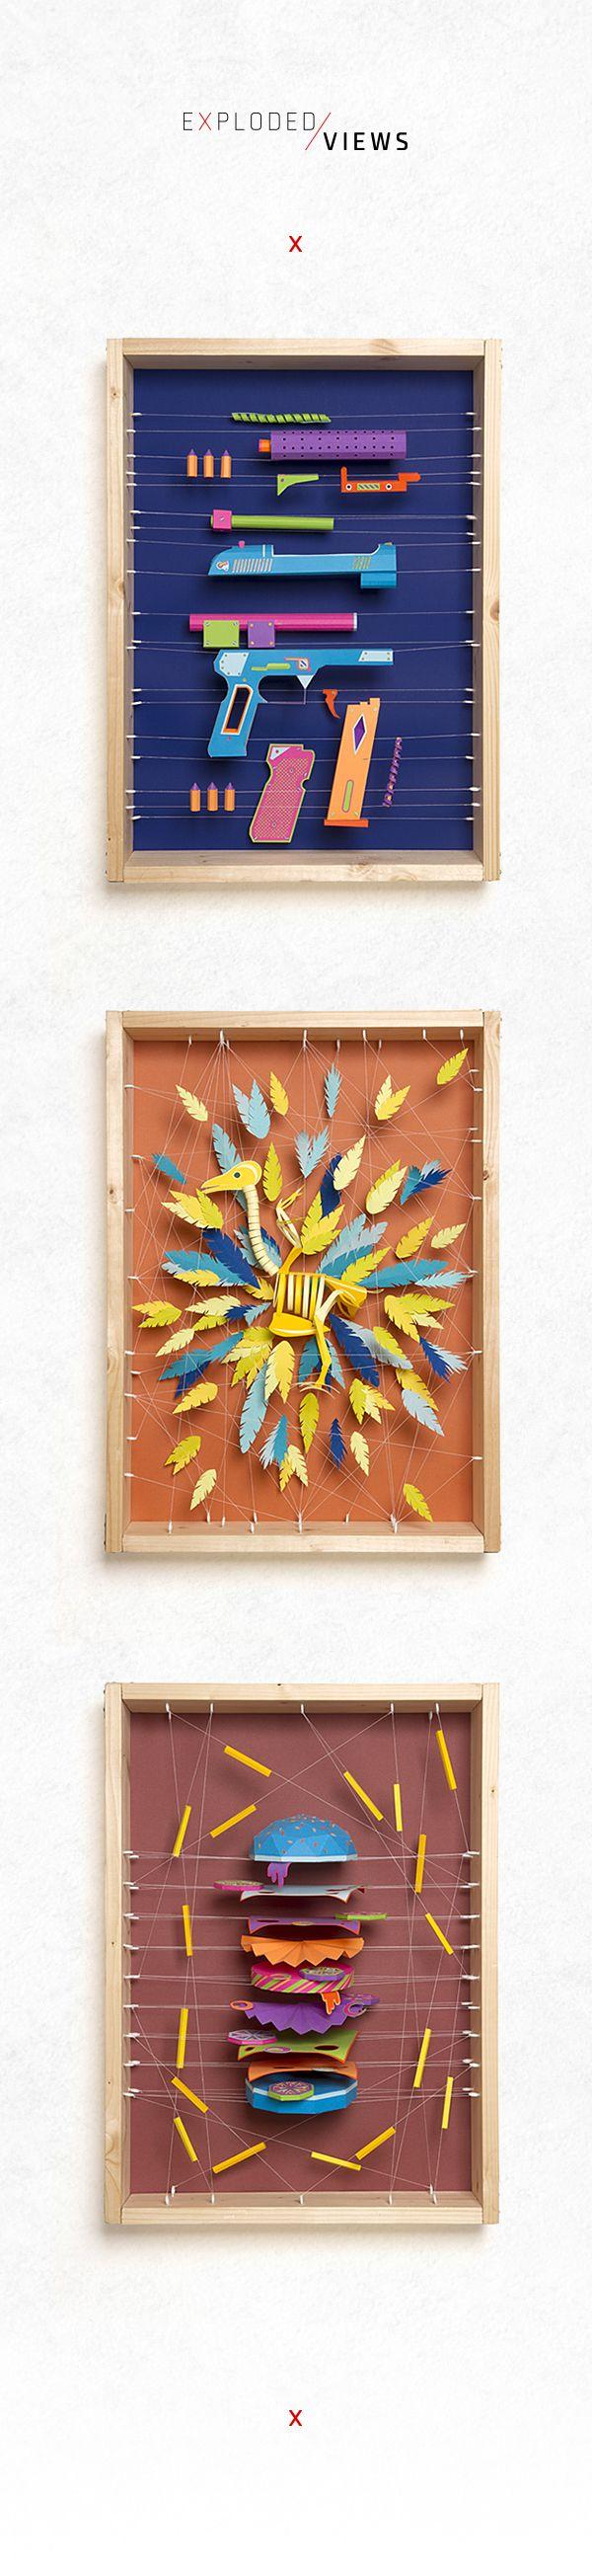 Creative Paper Sculptures Works by Zim & Zou | Abduzeedo Design Inspiration